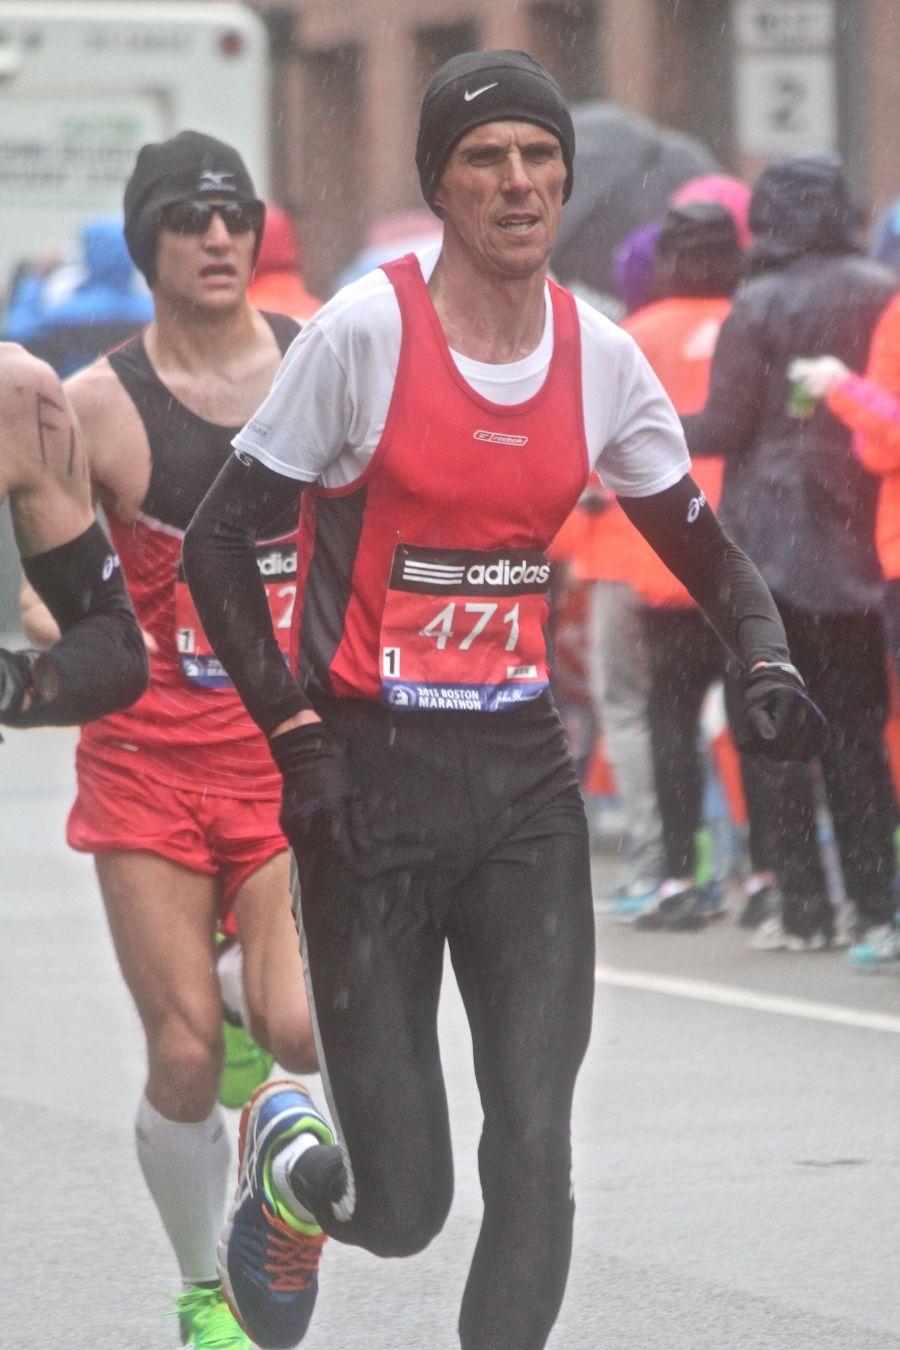 boston marathon april 20 2015 racer number 471 rain